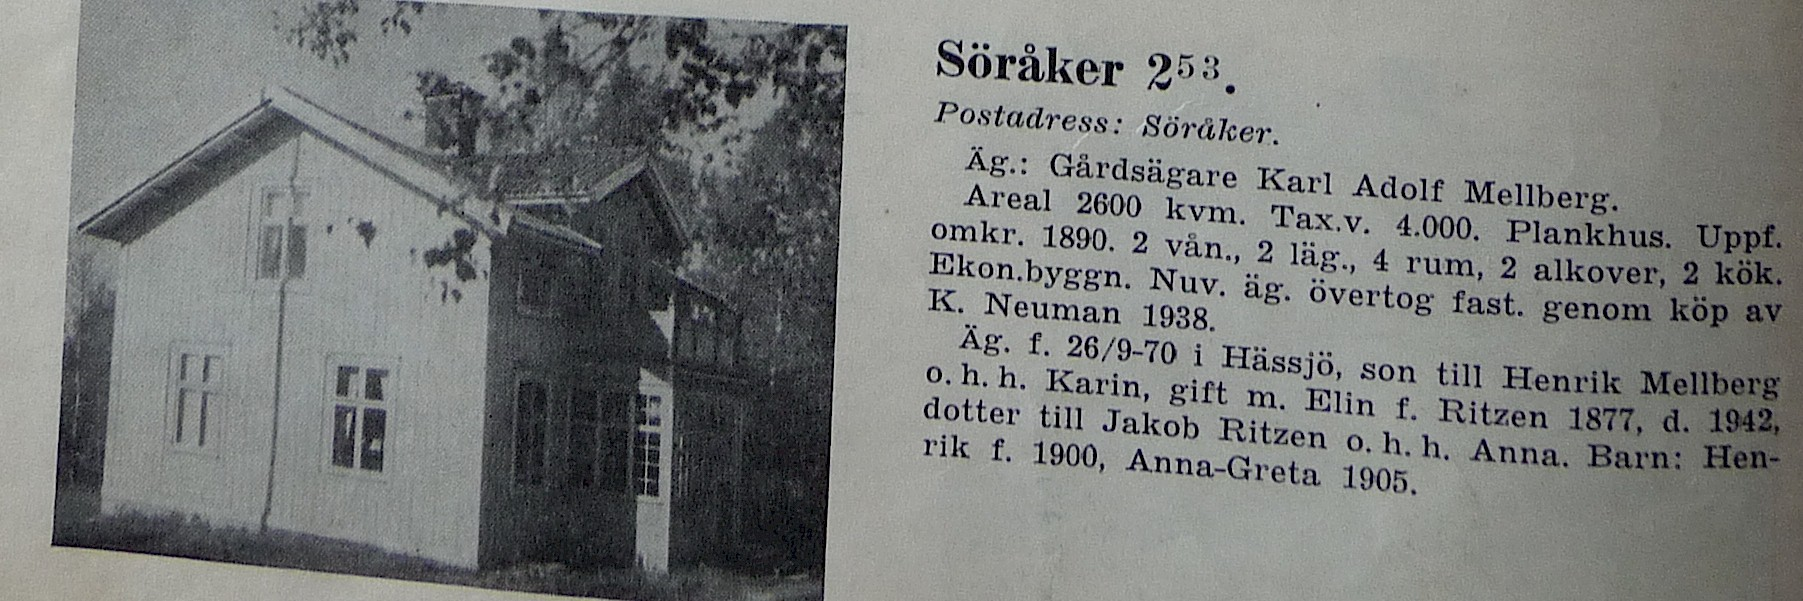 Greta and karl - 4 10